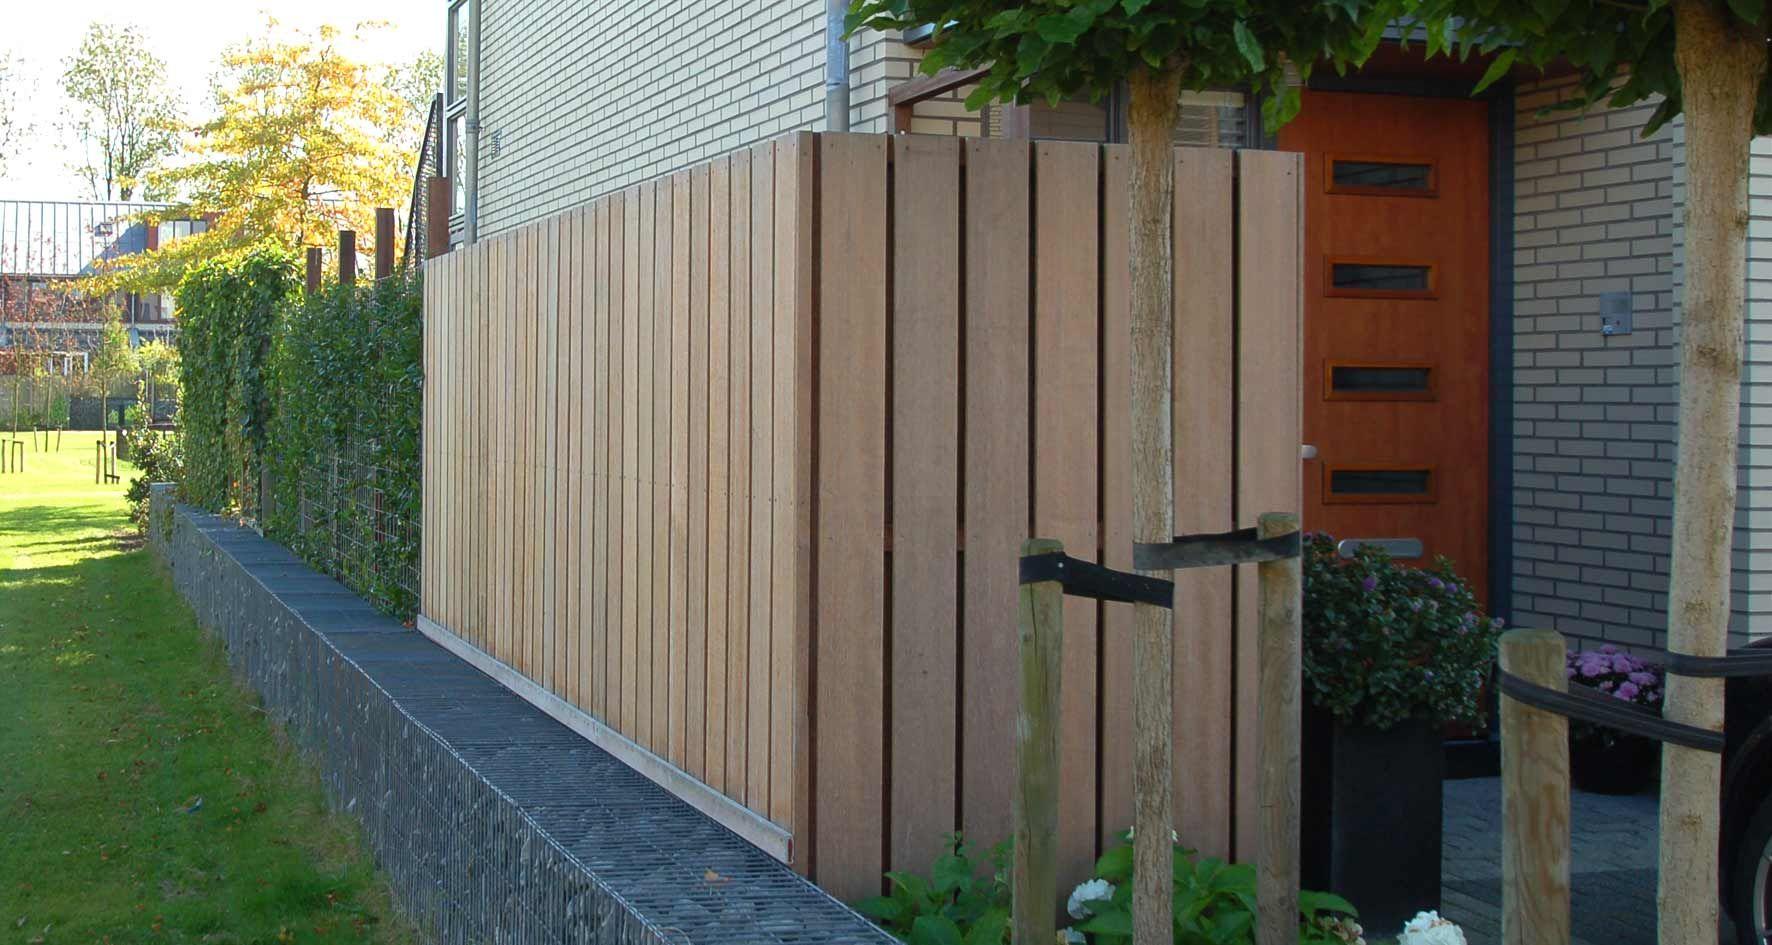 Hardhouten bankirai schutting van staande delen tuin pinterest garden landscape design - Planken modern design ...